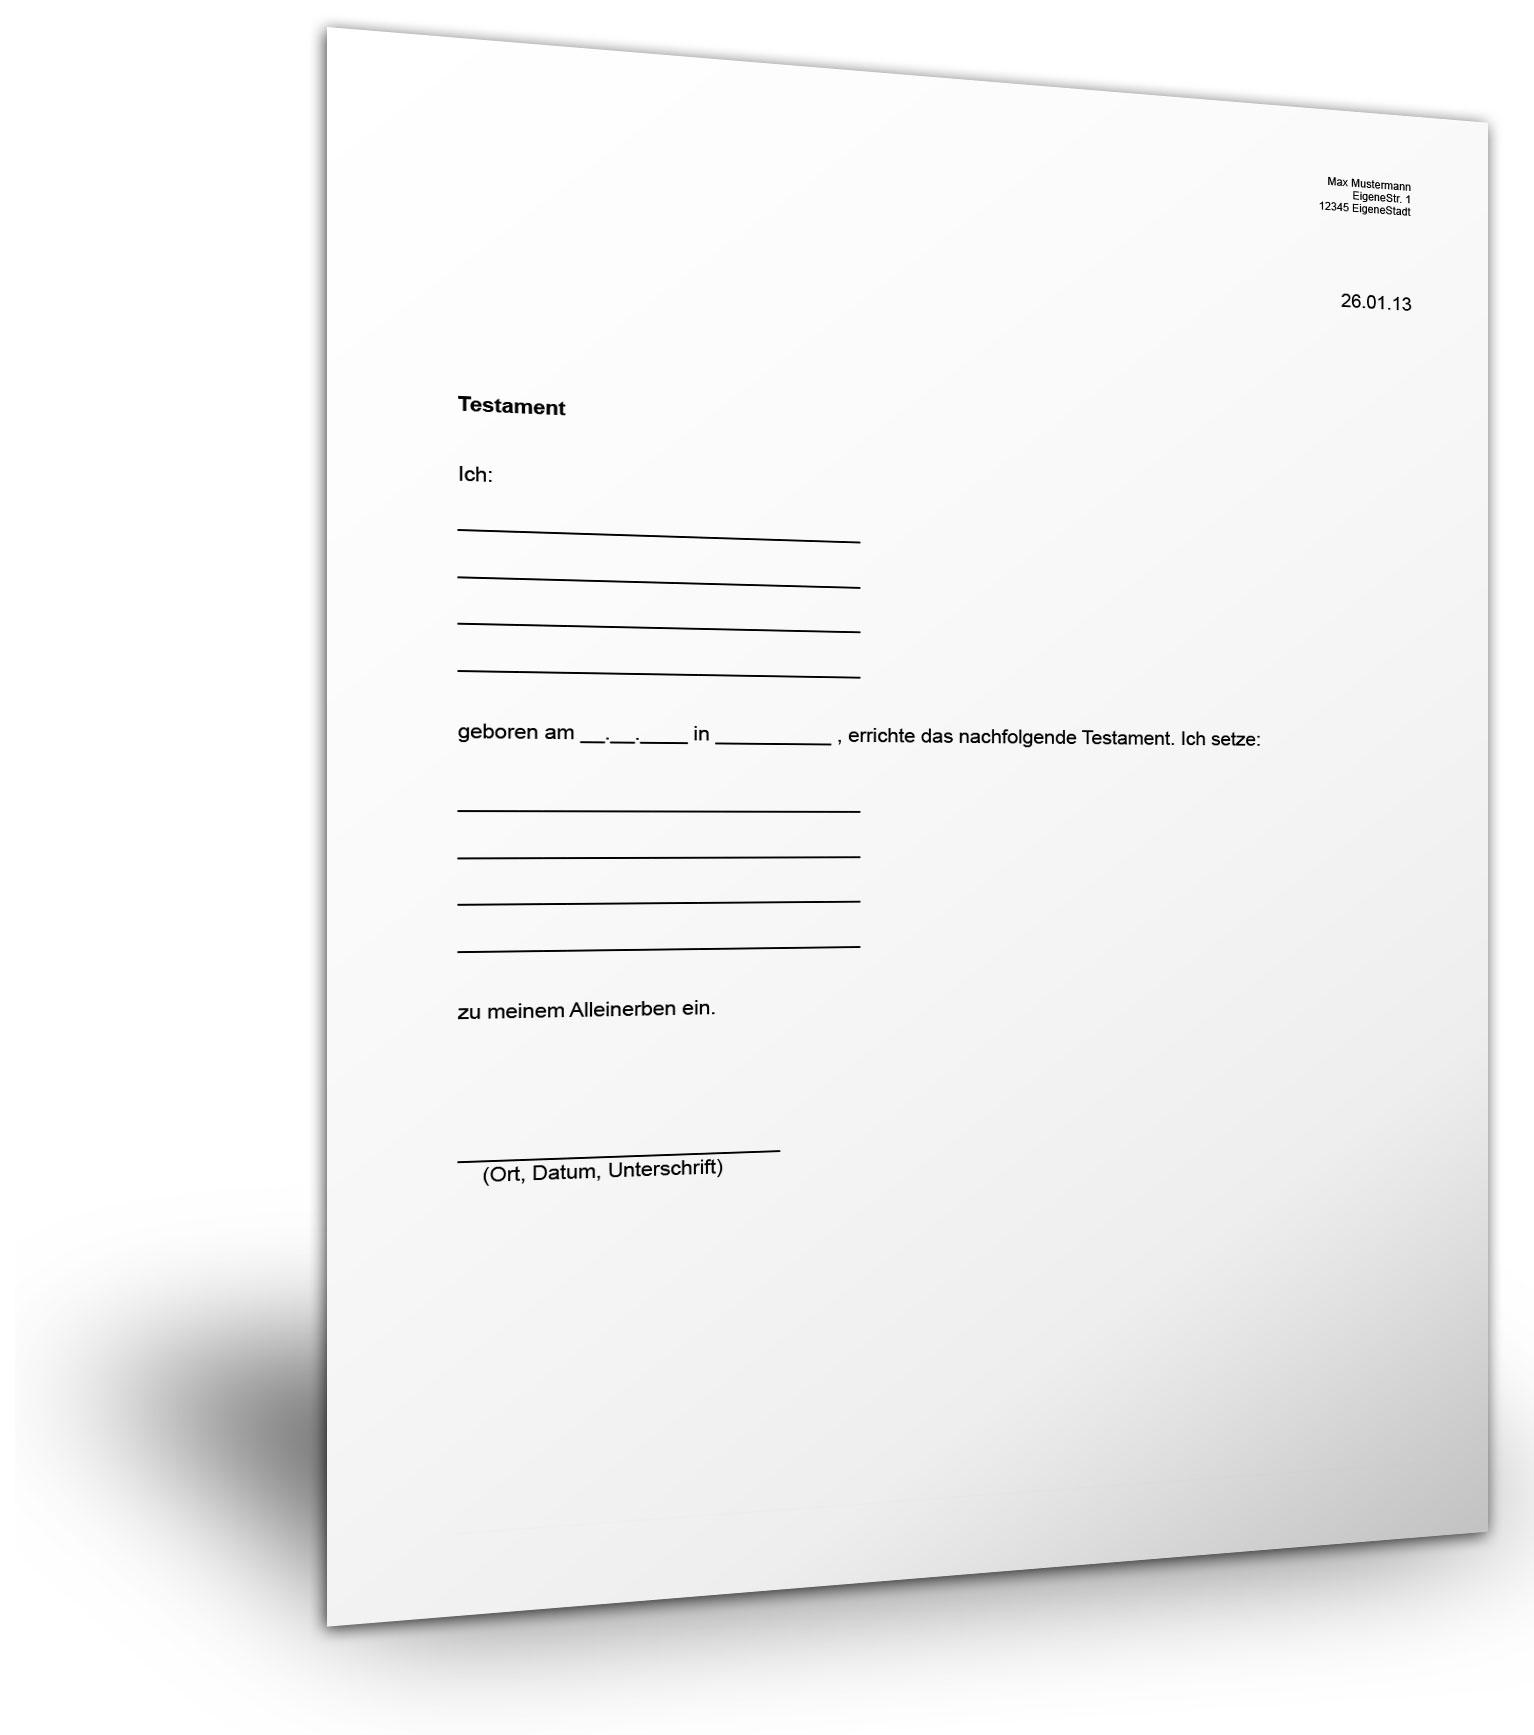 testamentvorlagecom